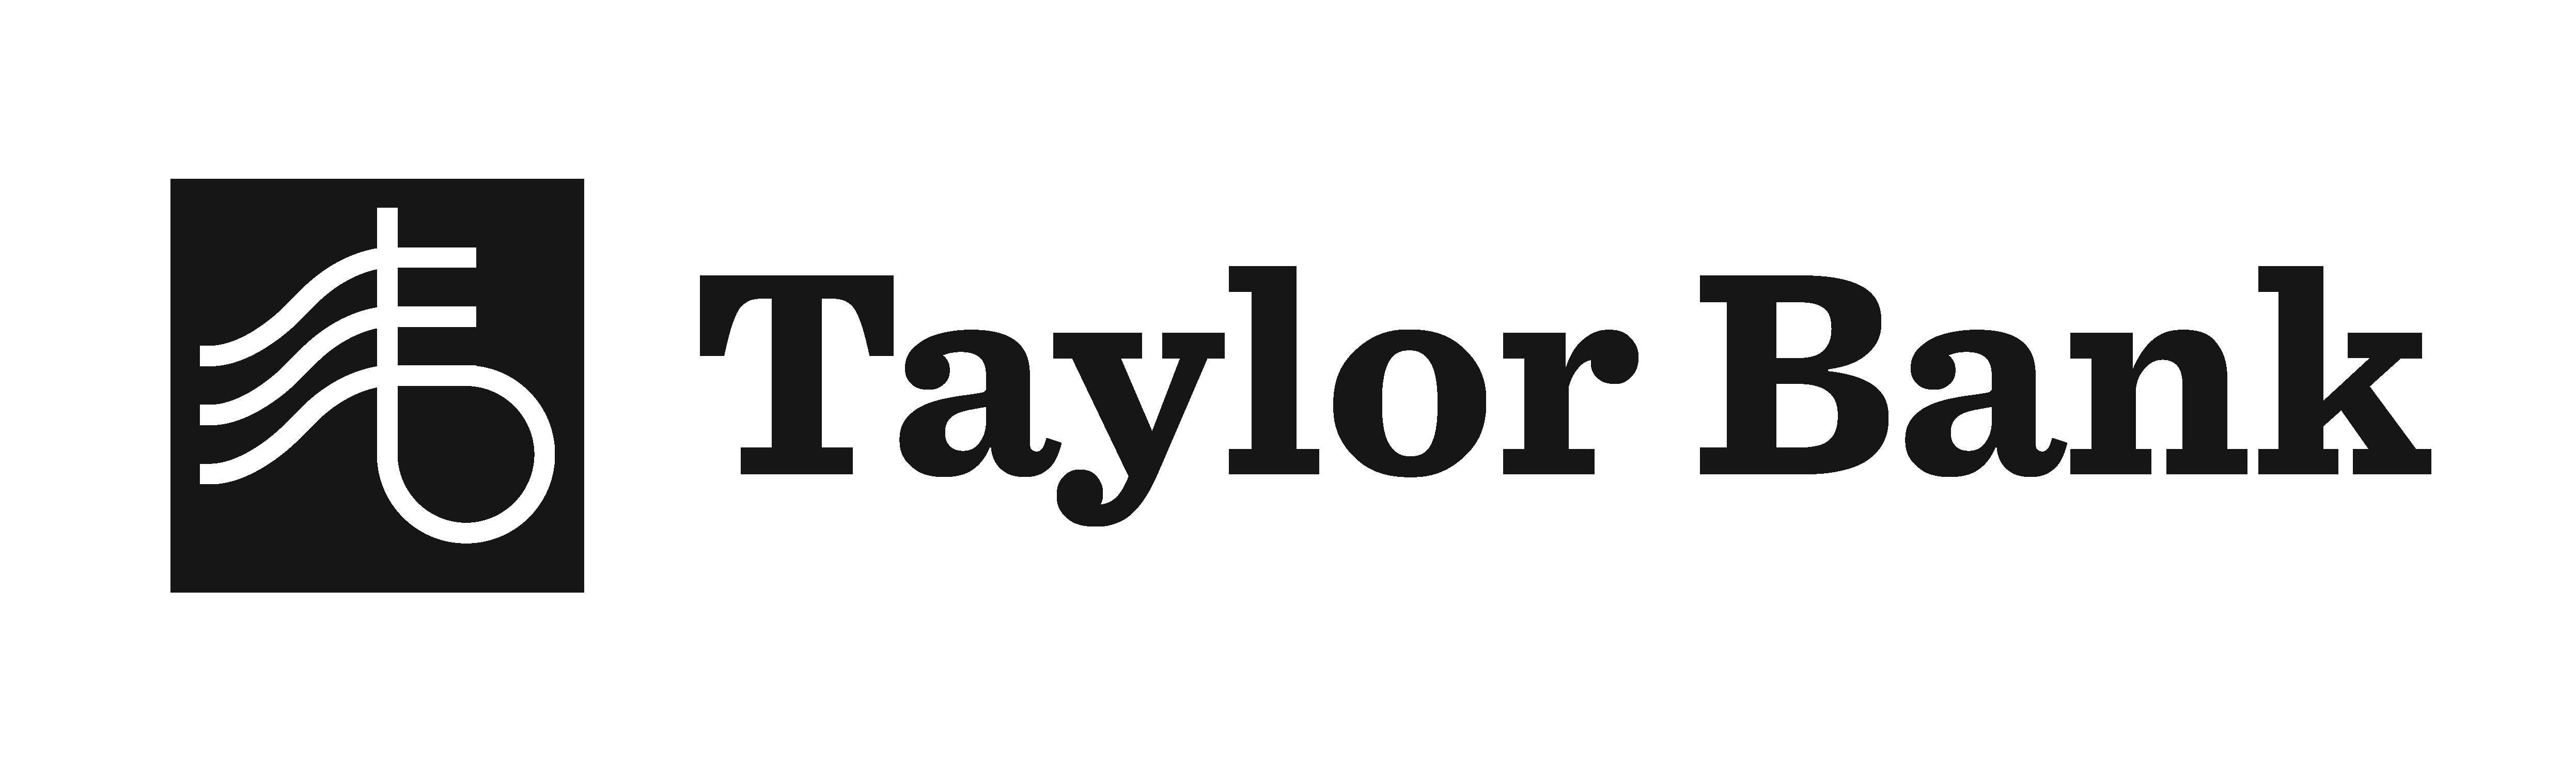 Taylor Bank Branding